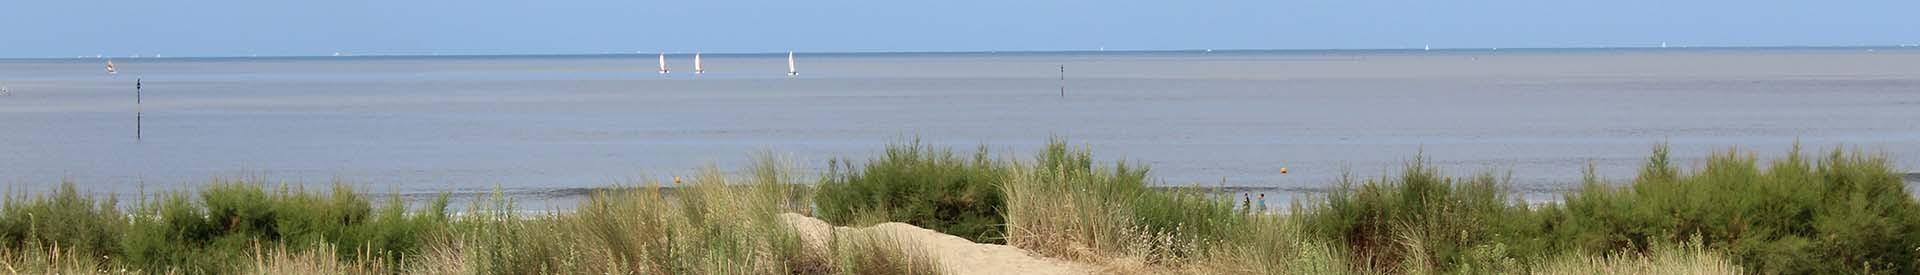 poste-secours-plage-ocean-st-brevin-1-119